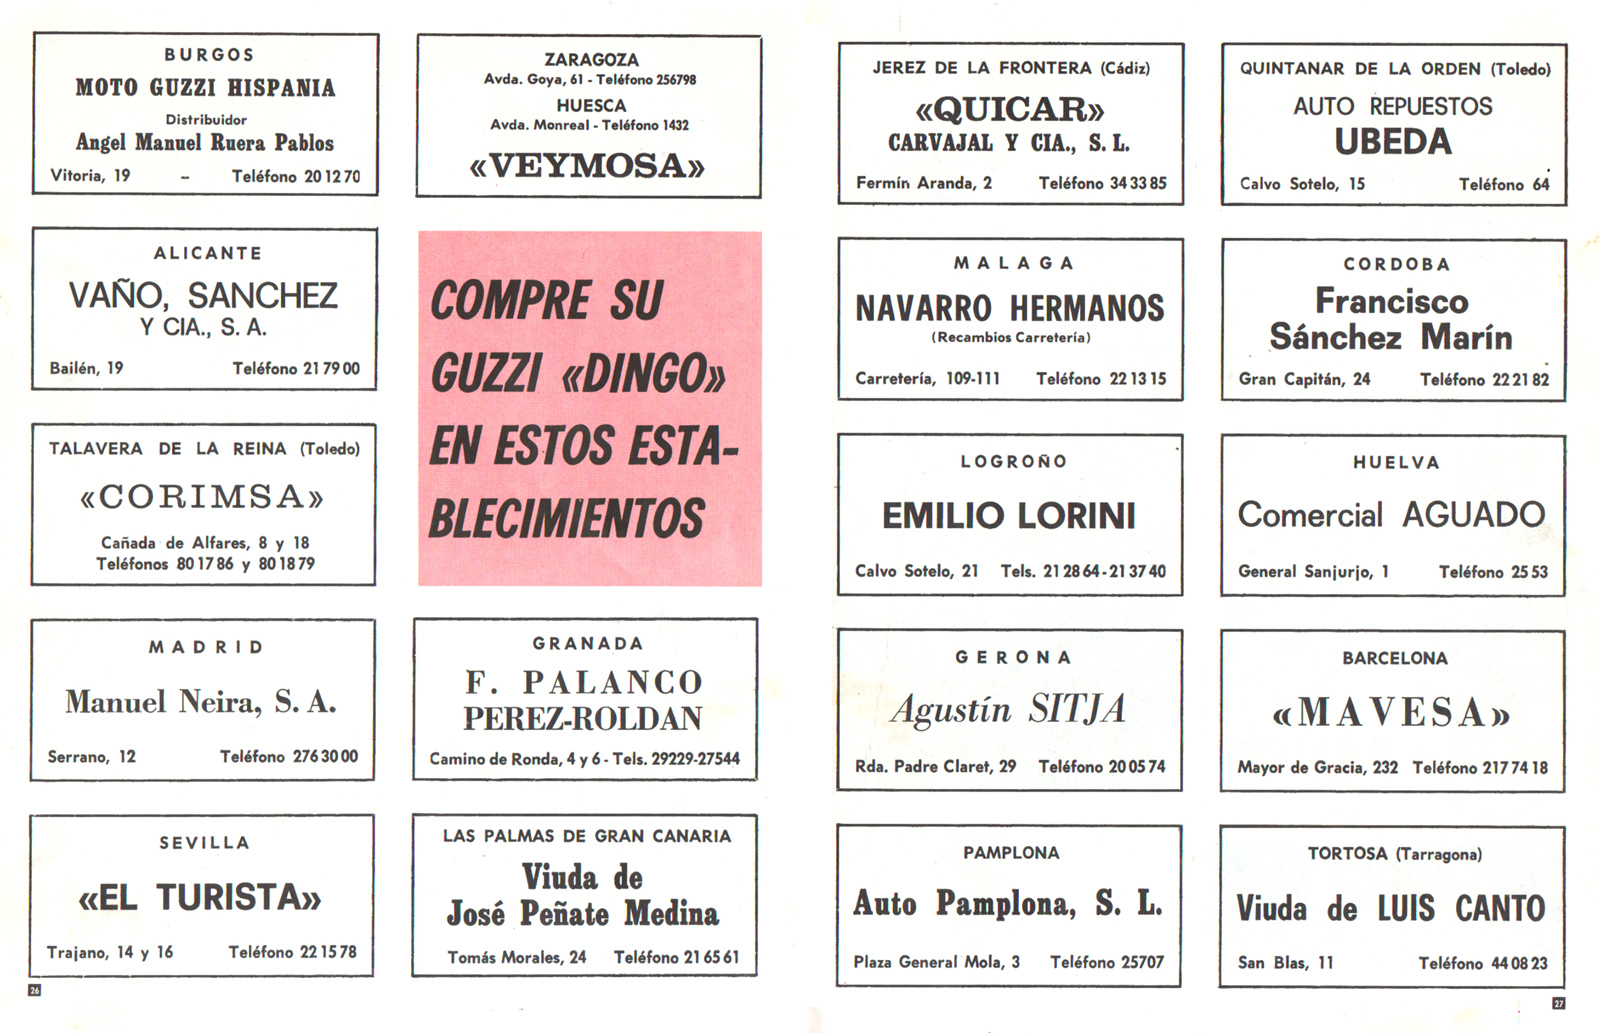 Prueba Guzzi Dingo 49 - 1966 1pjprr